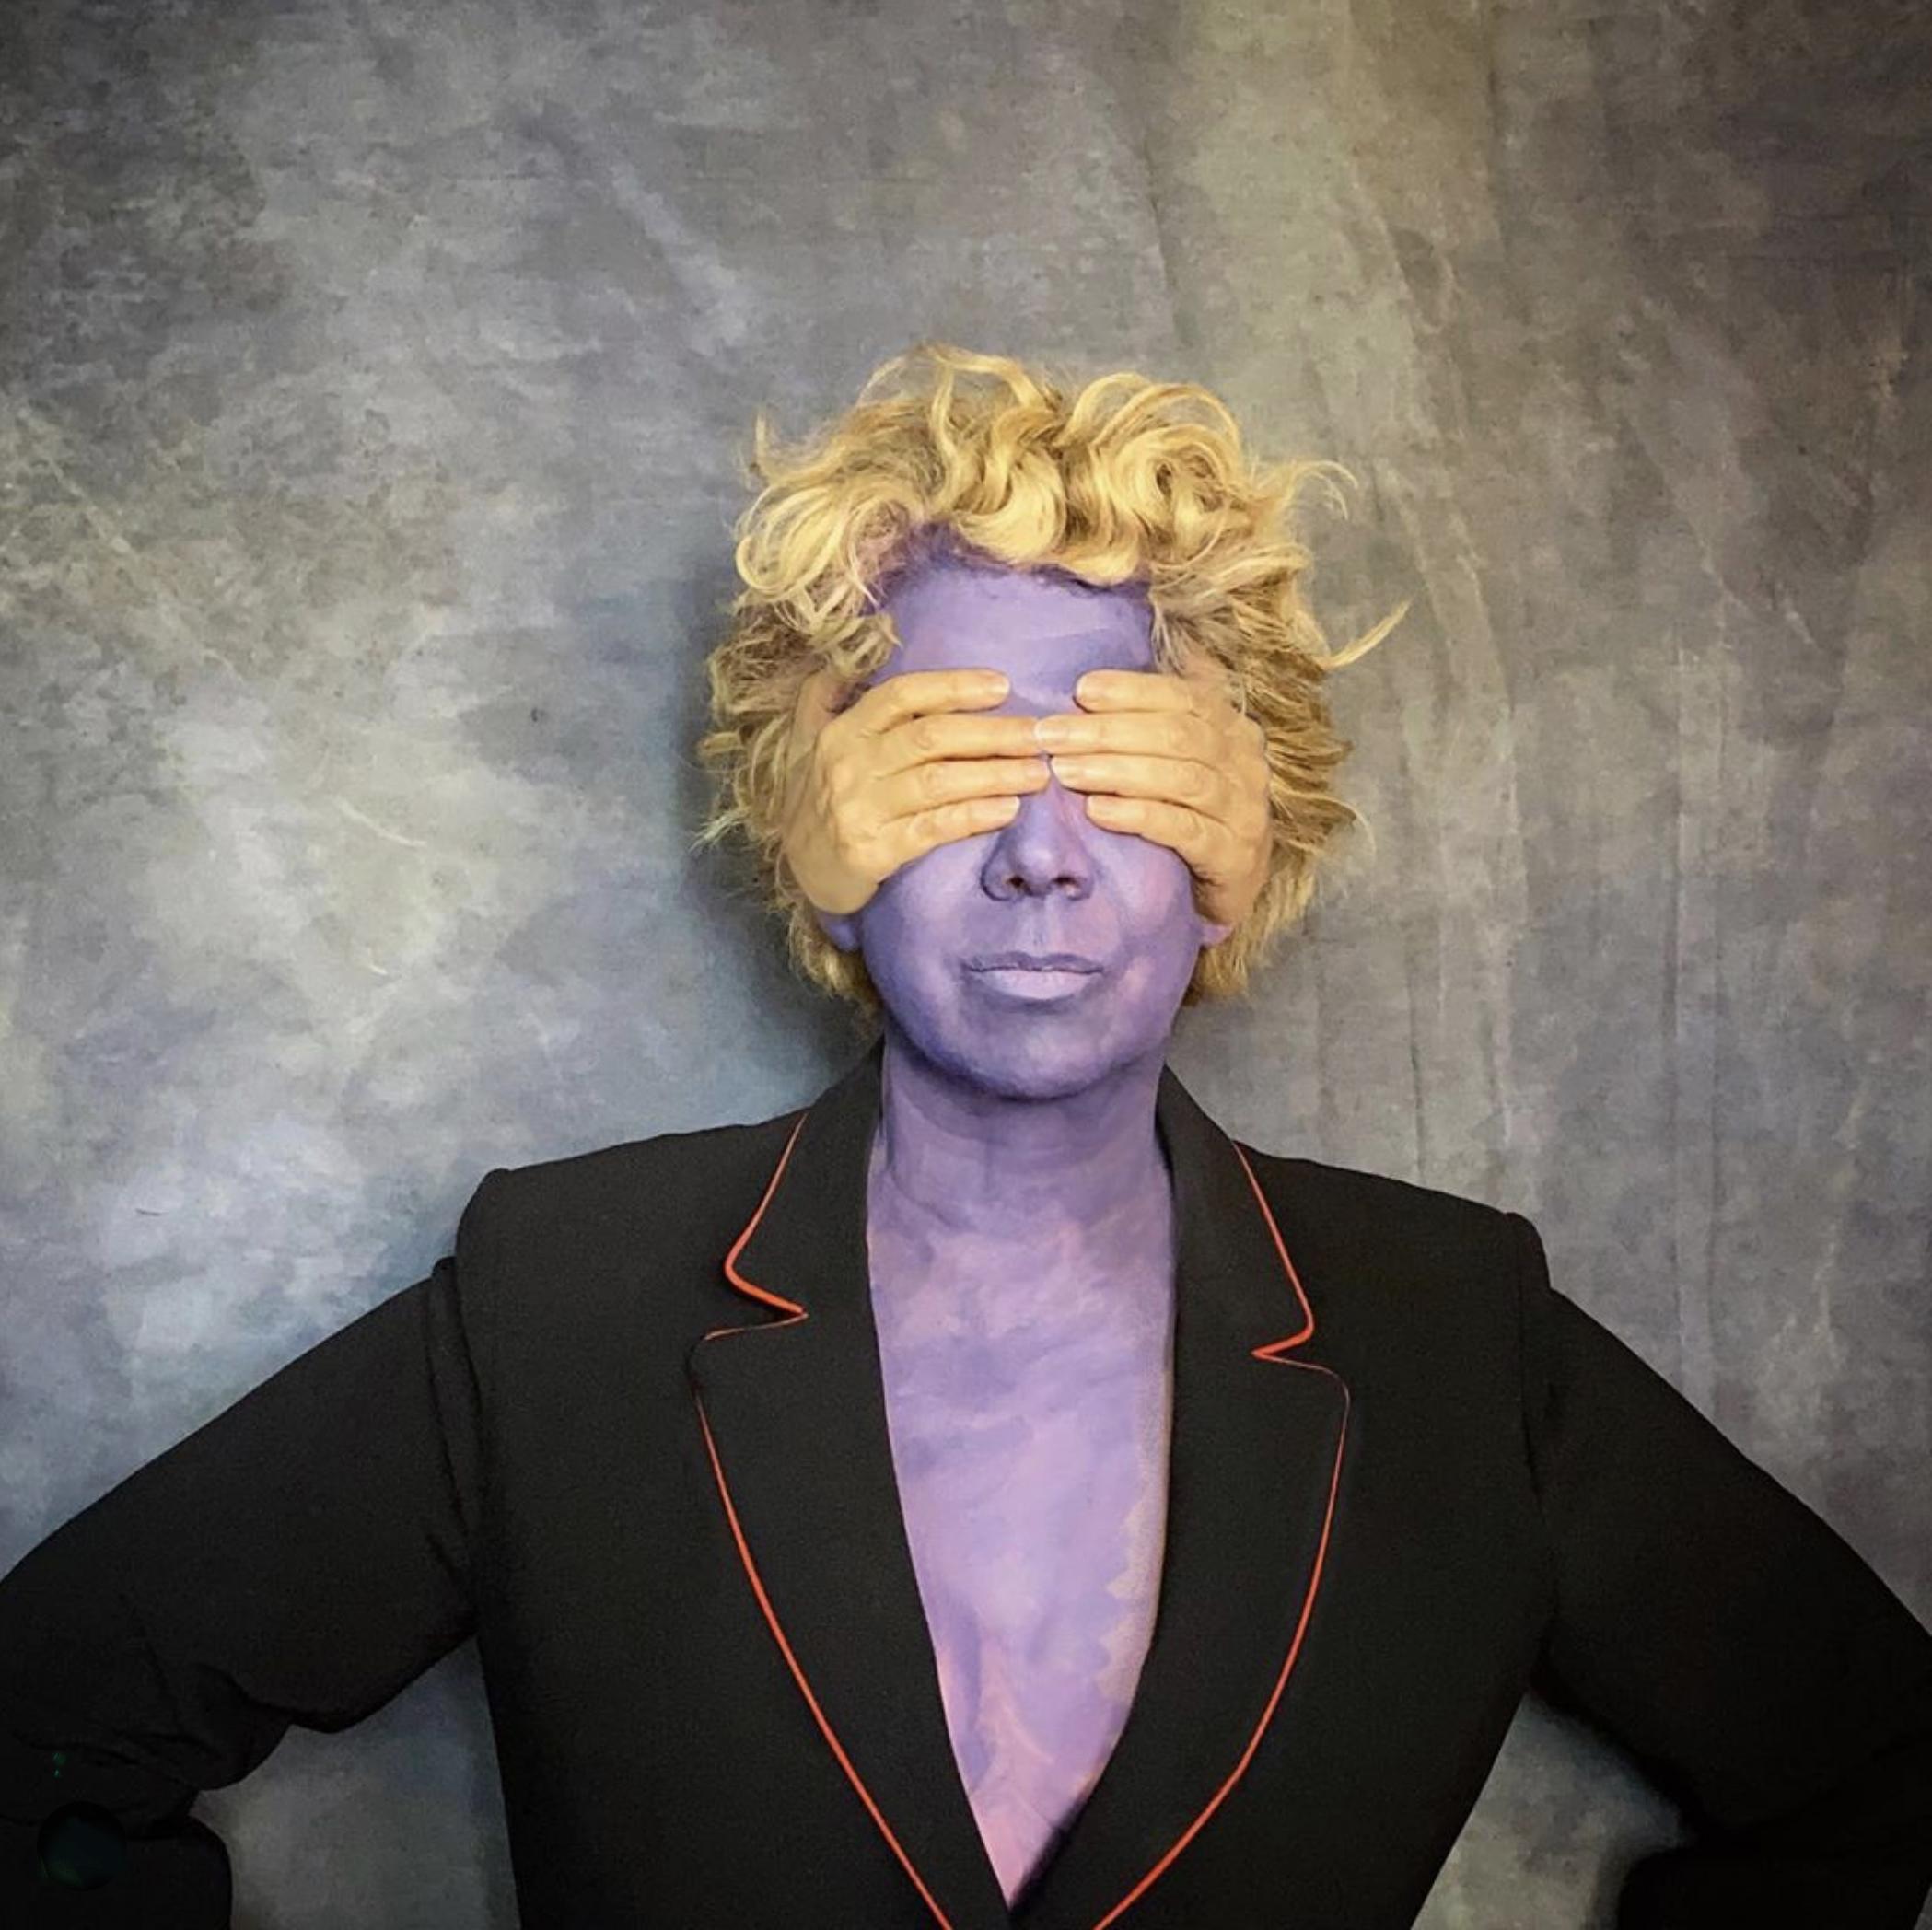 © Hélène Guétary (Paris, France) | Hand made blinding mask